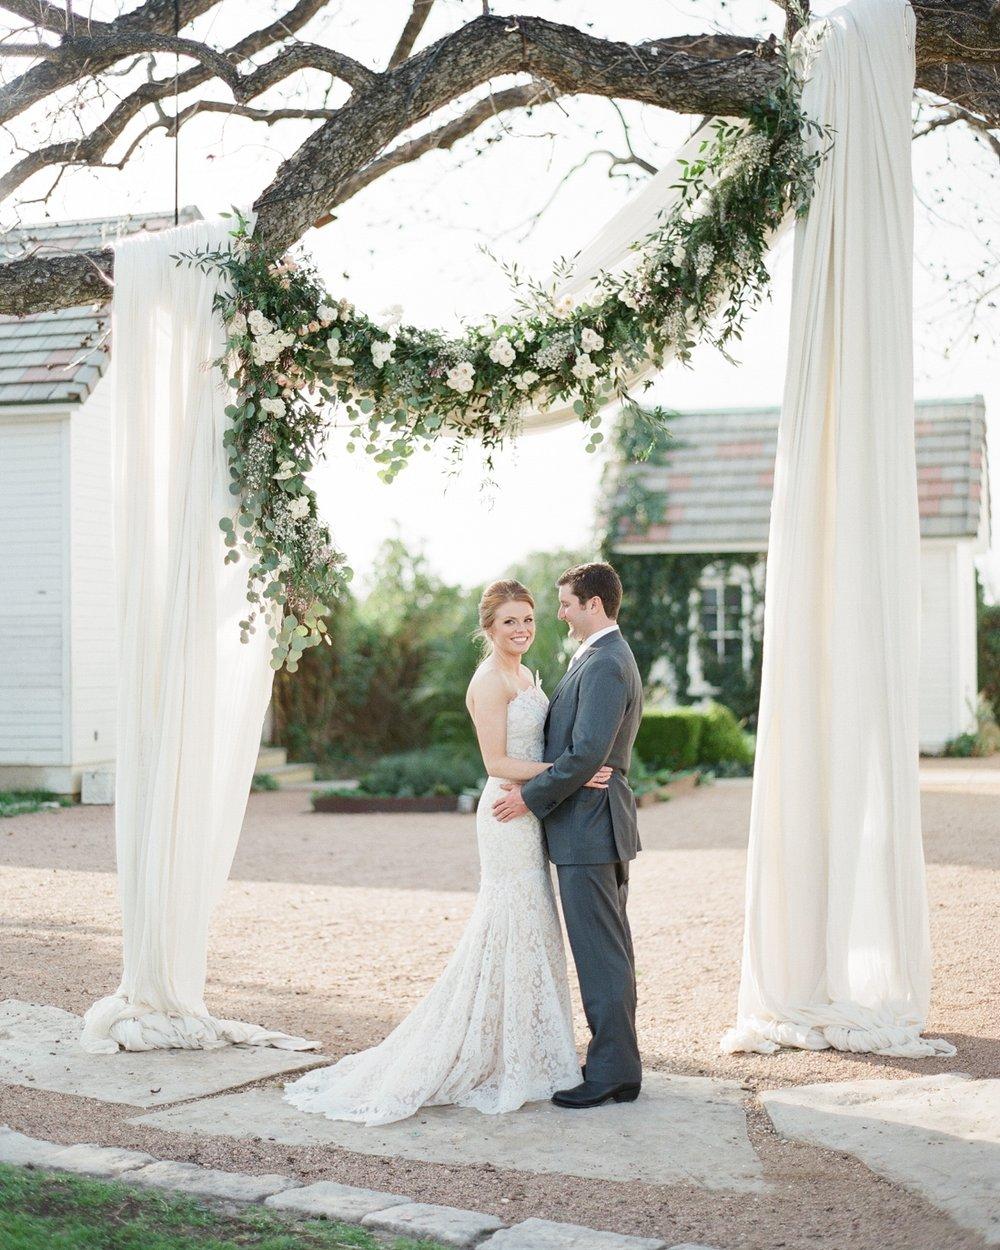 Patrick & Heather - AUSTIN TX- WEDDING